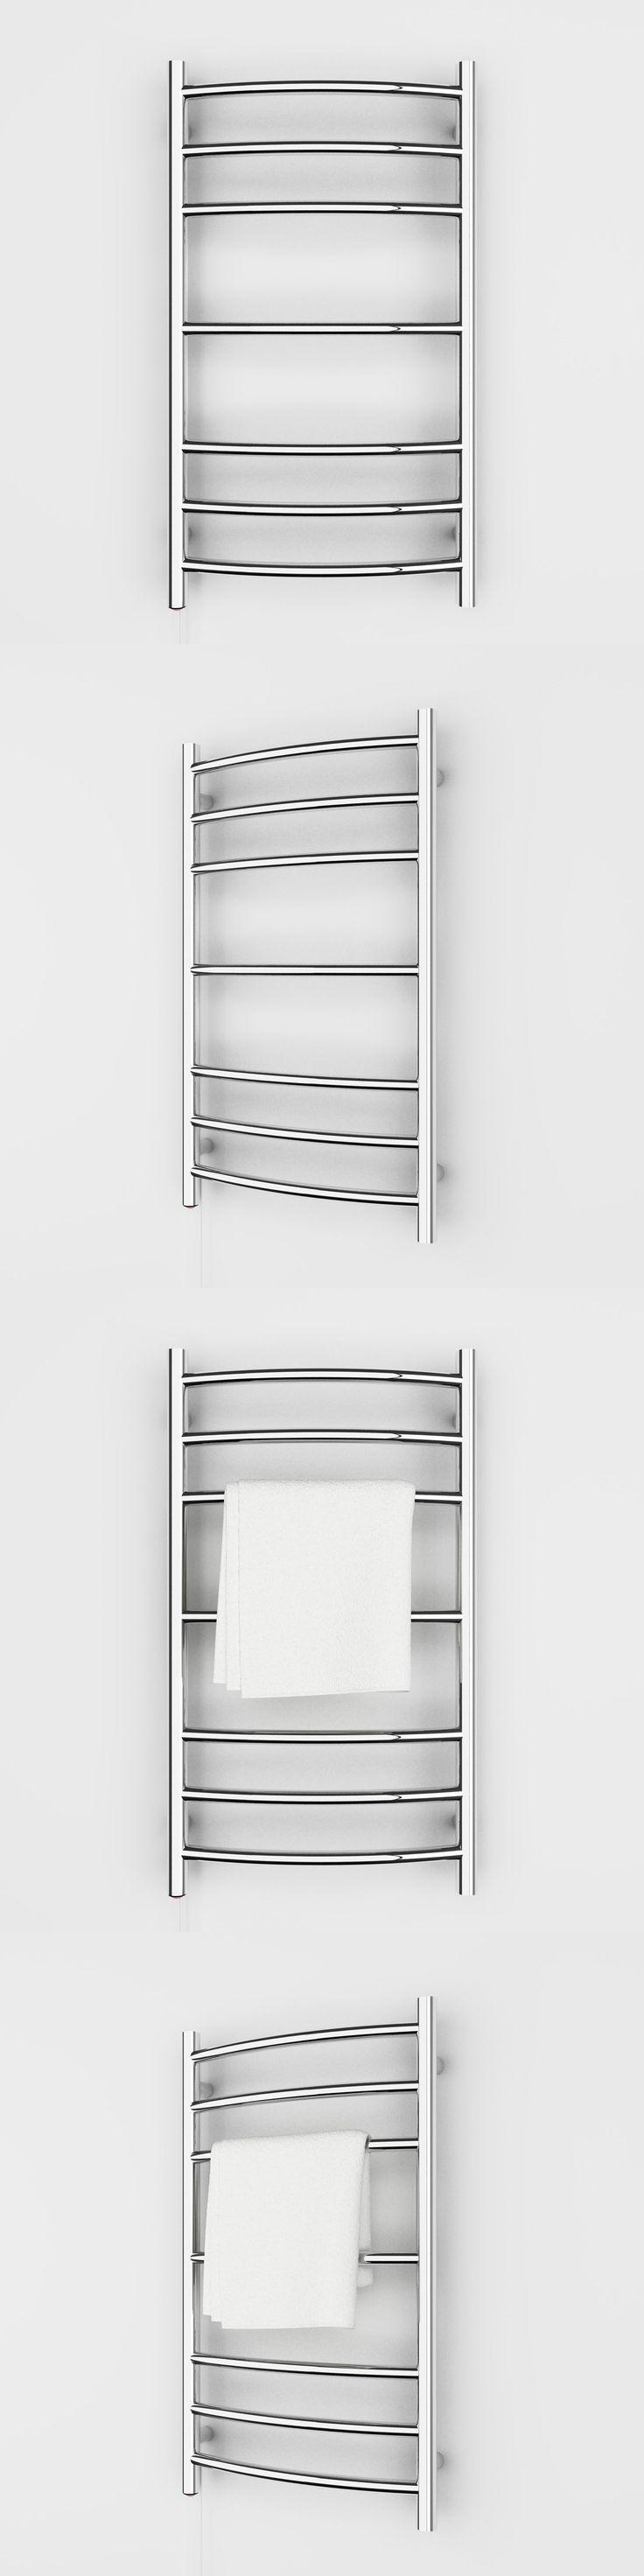 towel racks sunny shower 70w towel rack warmer electric drying heated wall mountbest 25 towel - Towel Warmer Rack